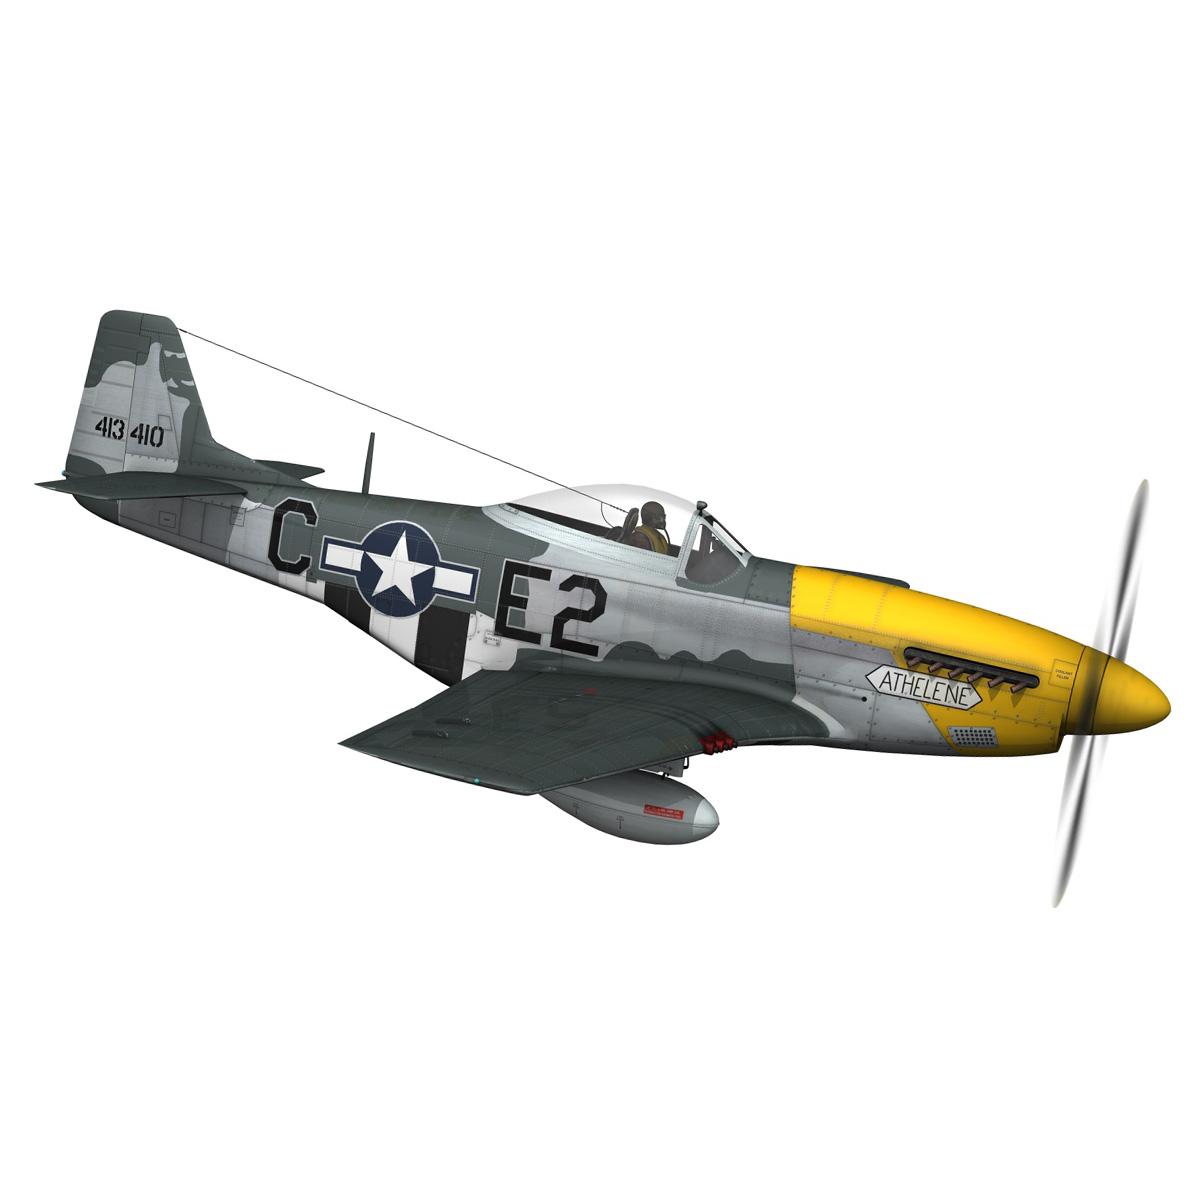 north american p-51d mustang – lou iv 3d model fbx c4d lwo obj 272604